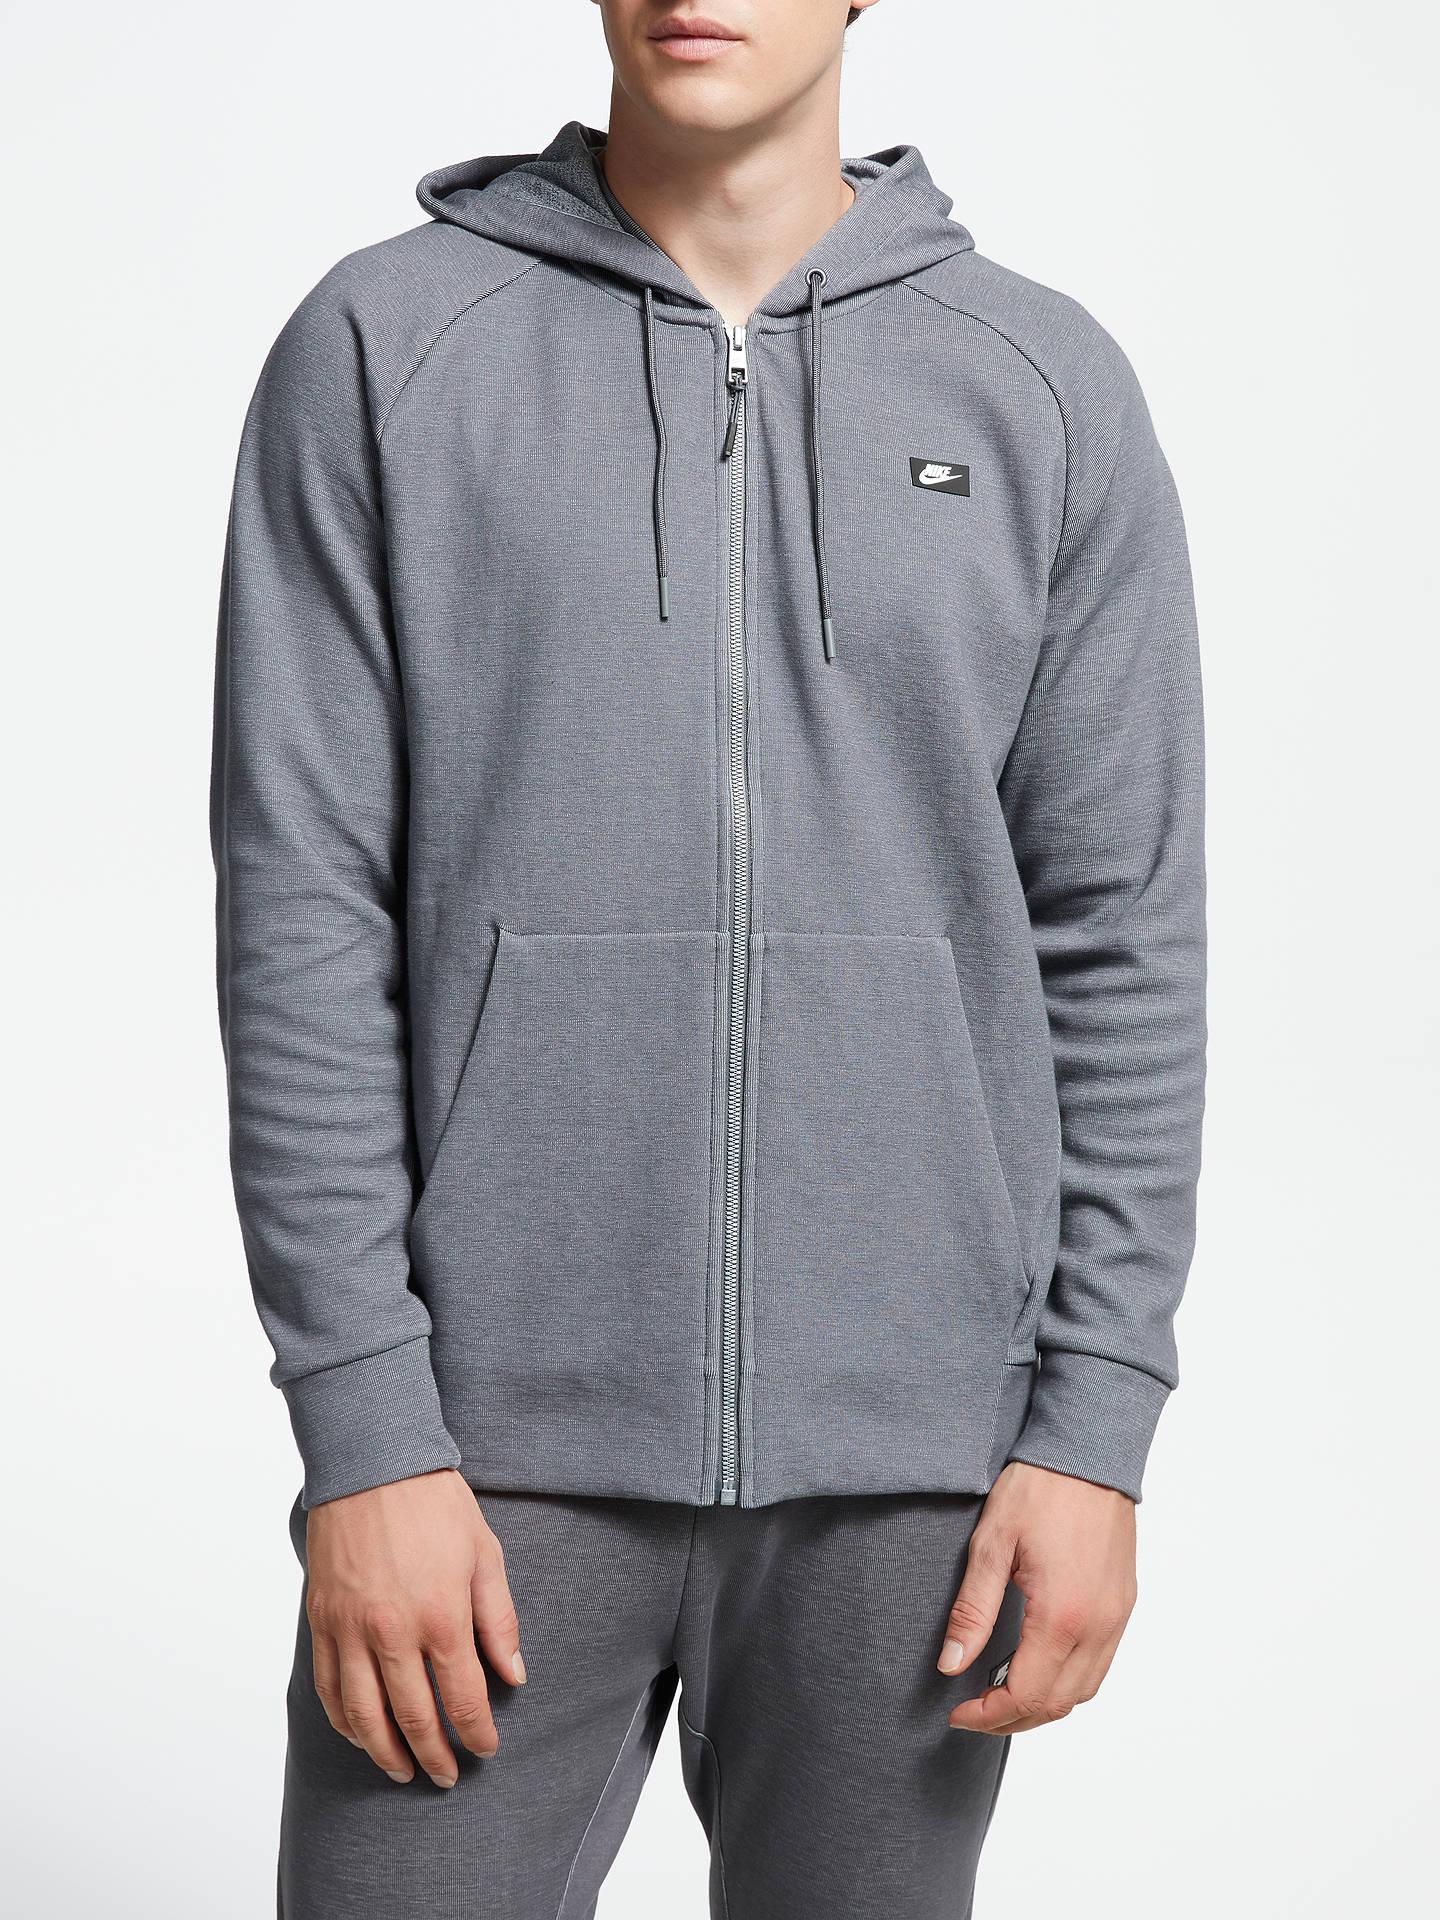 a4cb12577136 Buy Nike Sportswear Optic Full Zip Hoodie